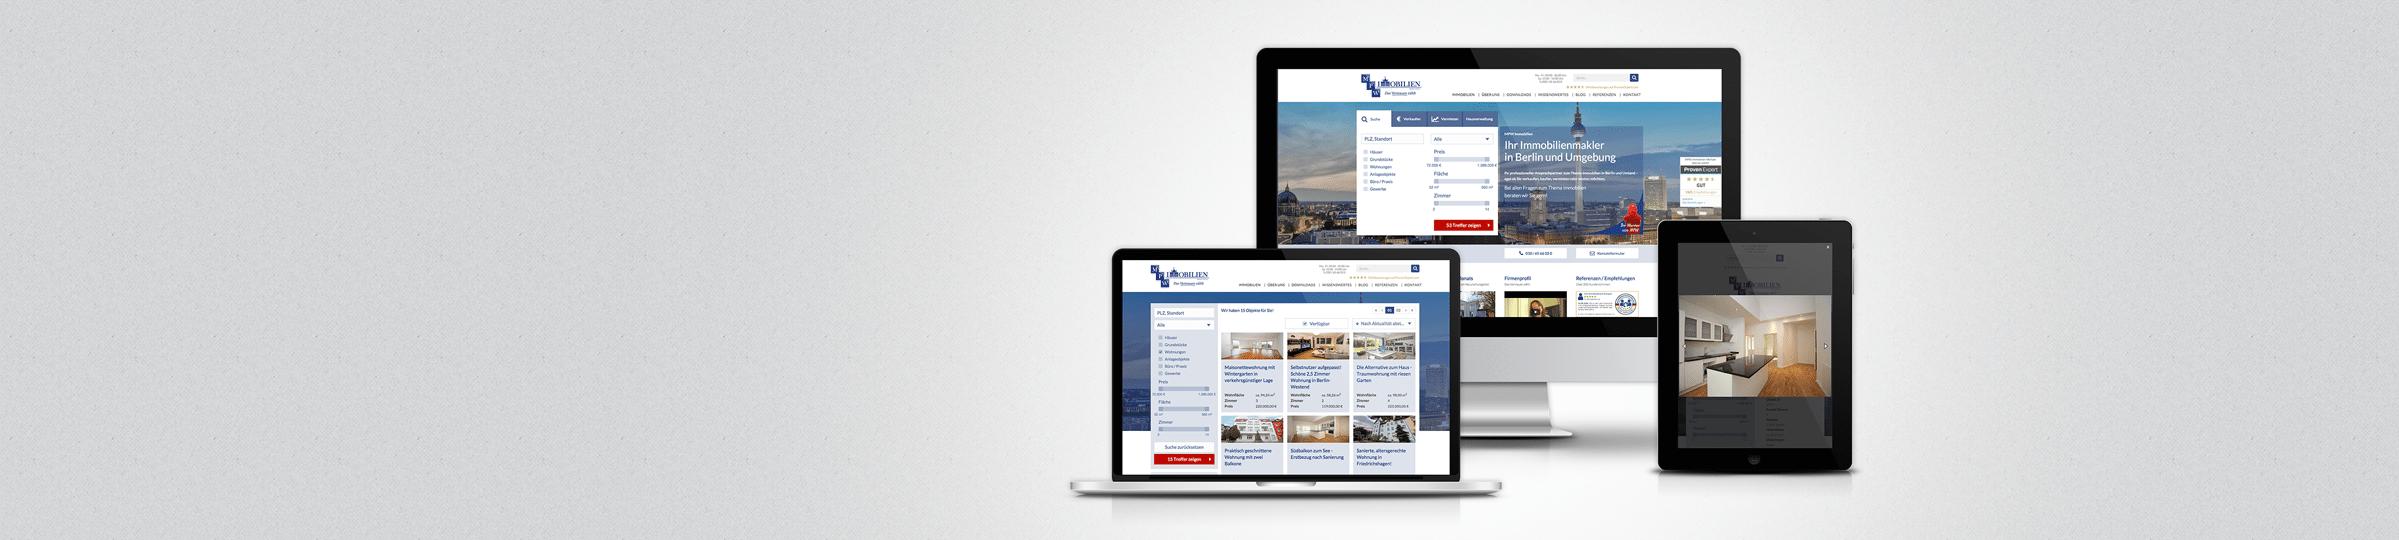 Immobilien-Website auf verschiedenen Endgeräten.